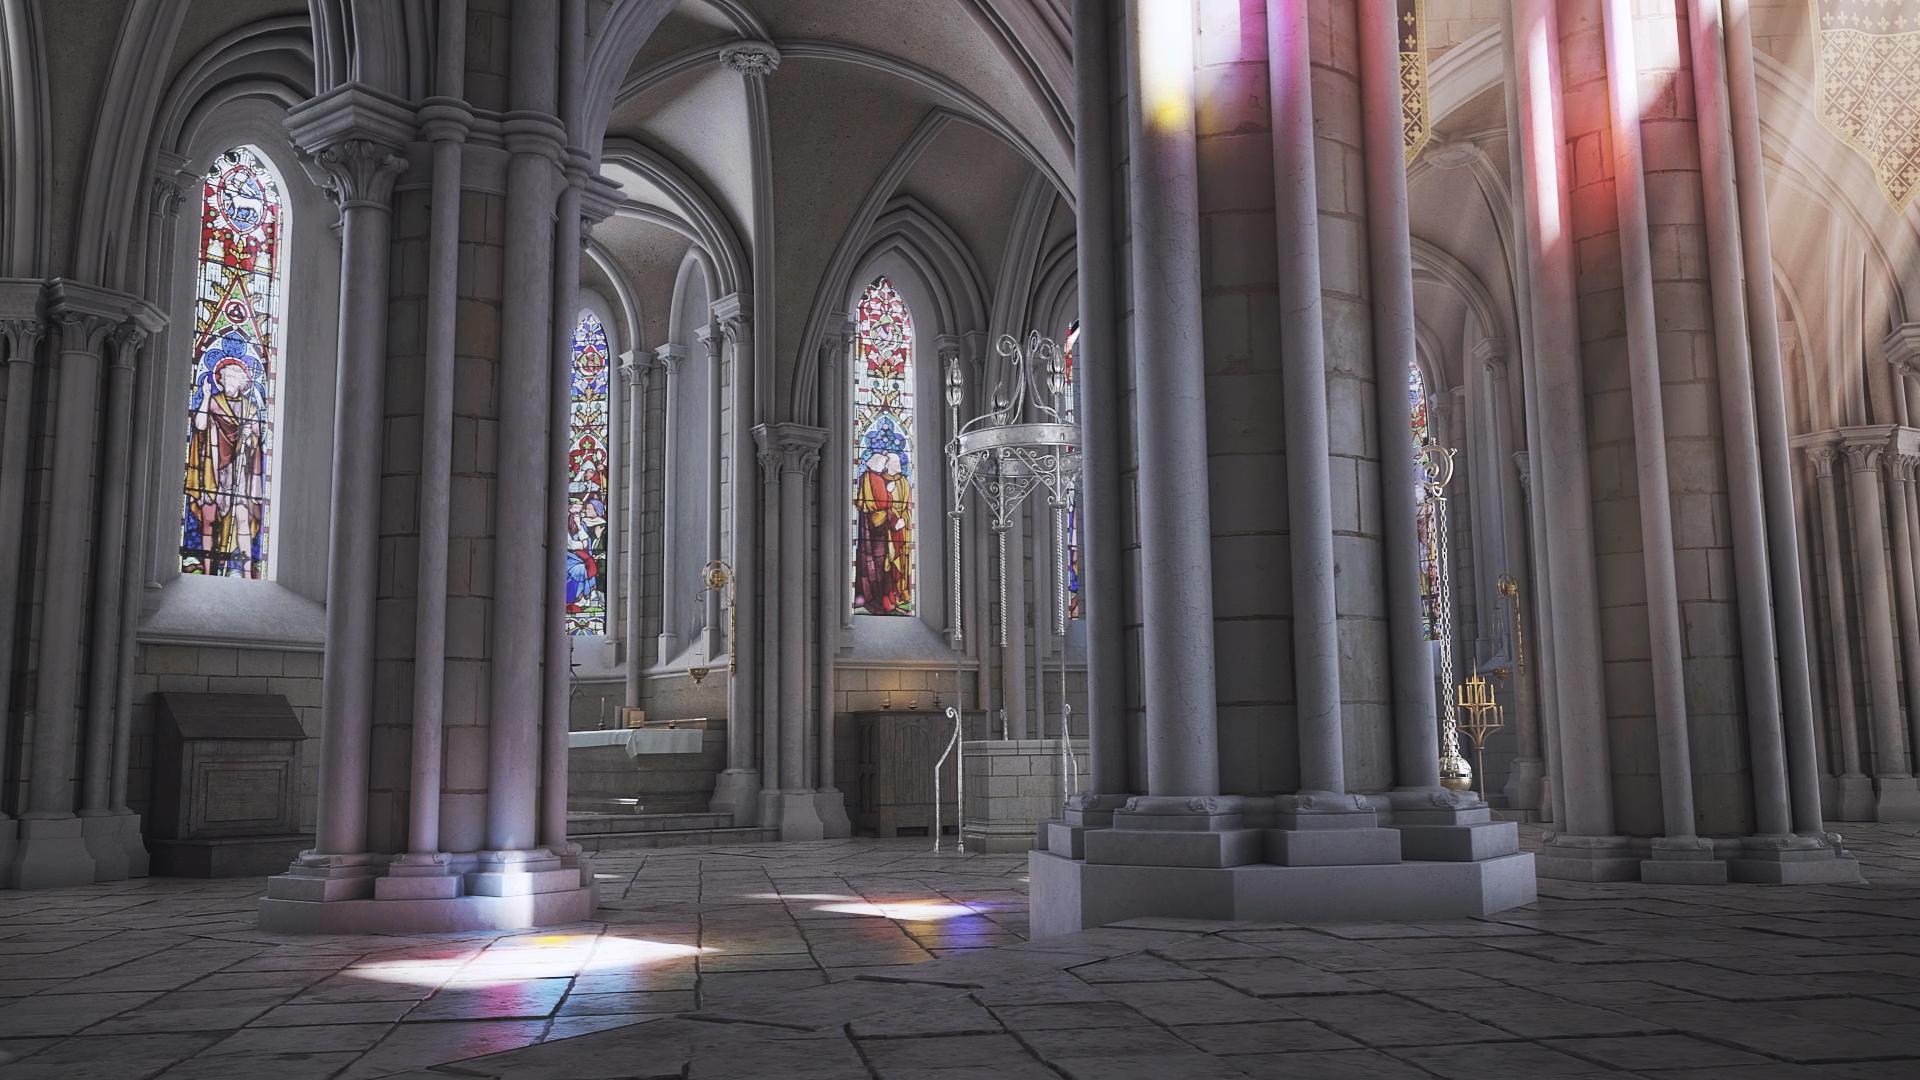 GALERIE-Dripmoon-Studio 3D-Tours-Reconstitution-Patrimoine-REVIS MARTIN (33) copie